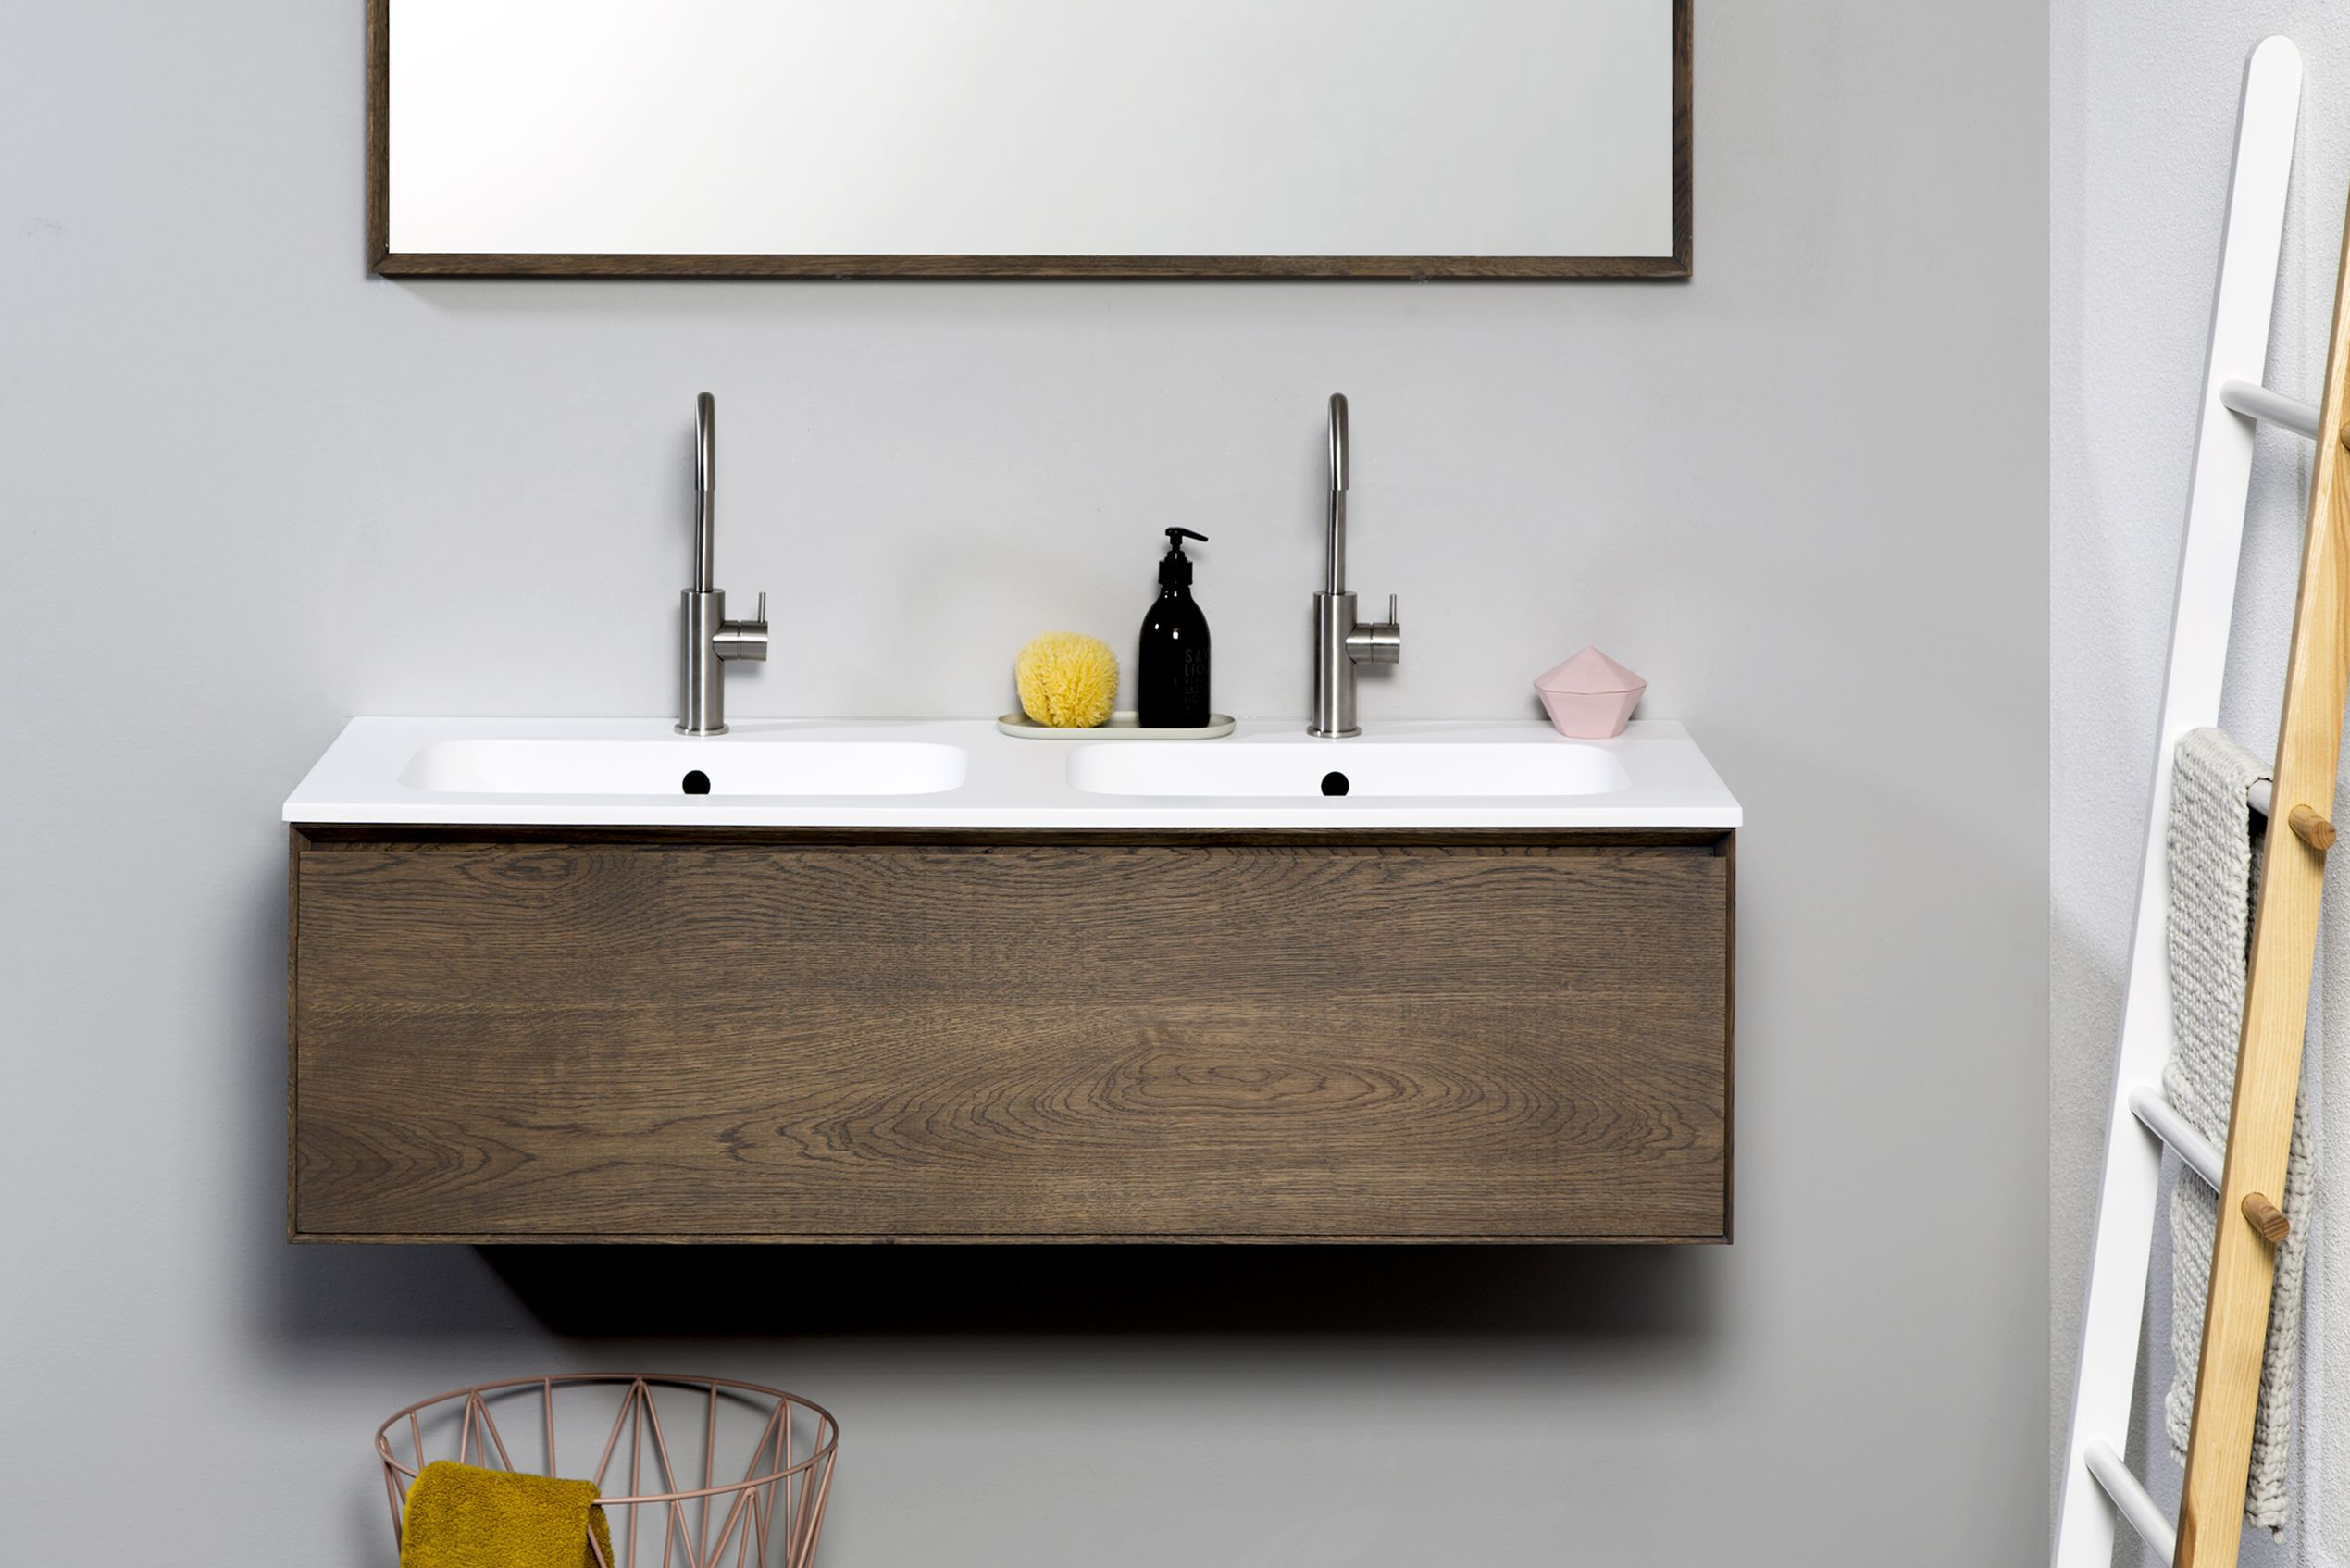 lavanto celio prachtige hoogwaardige badkamermeubel van massief